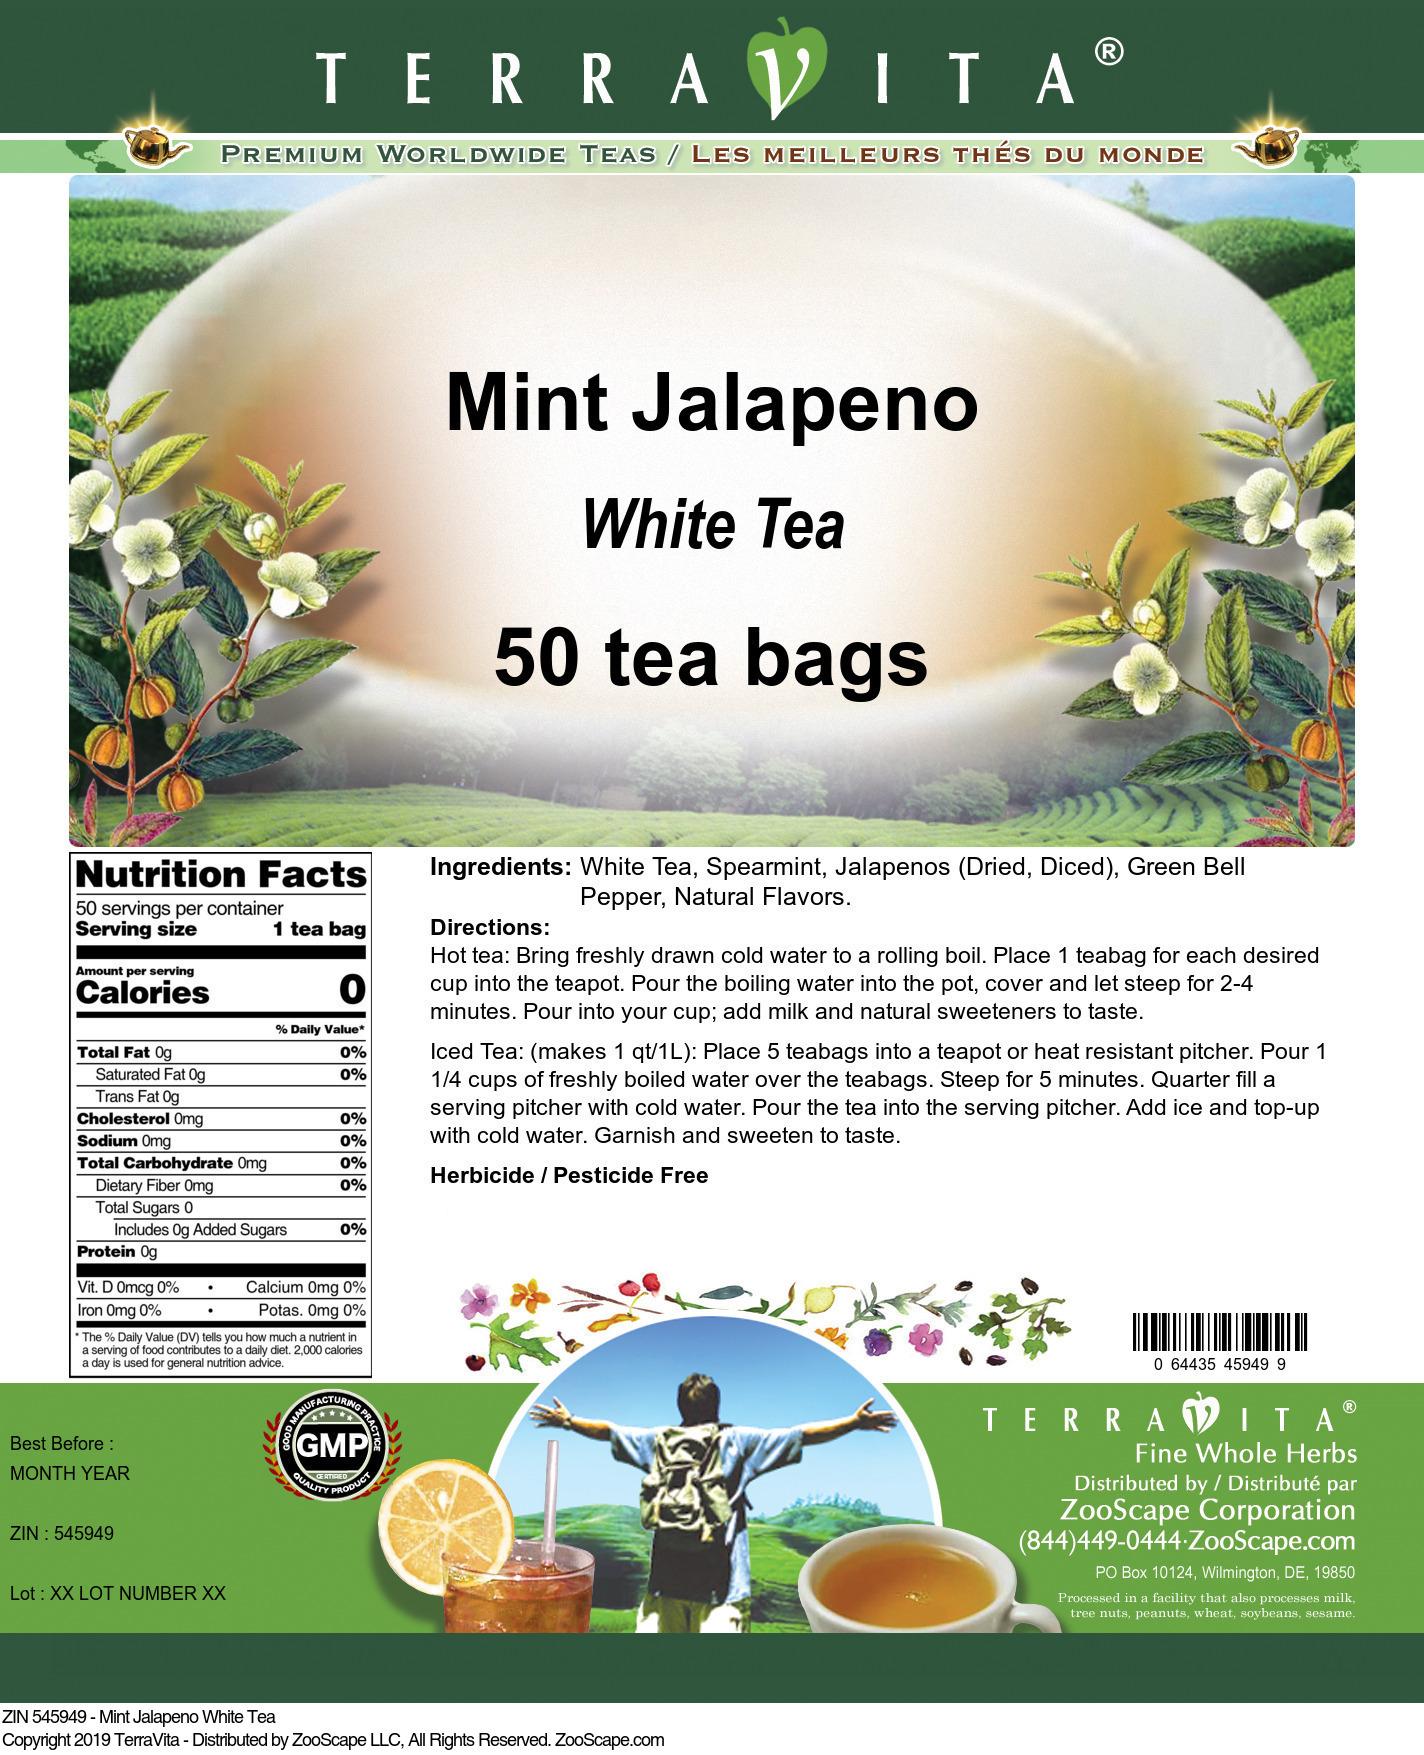 Mint Jalapeno White Tea